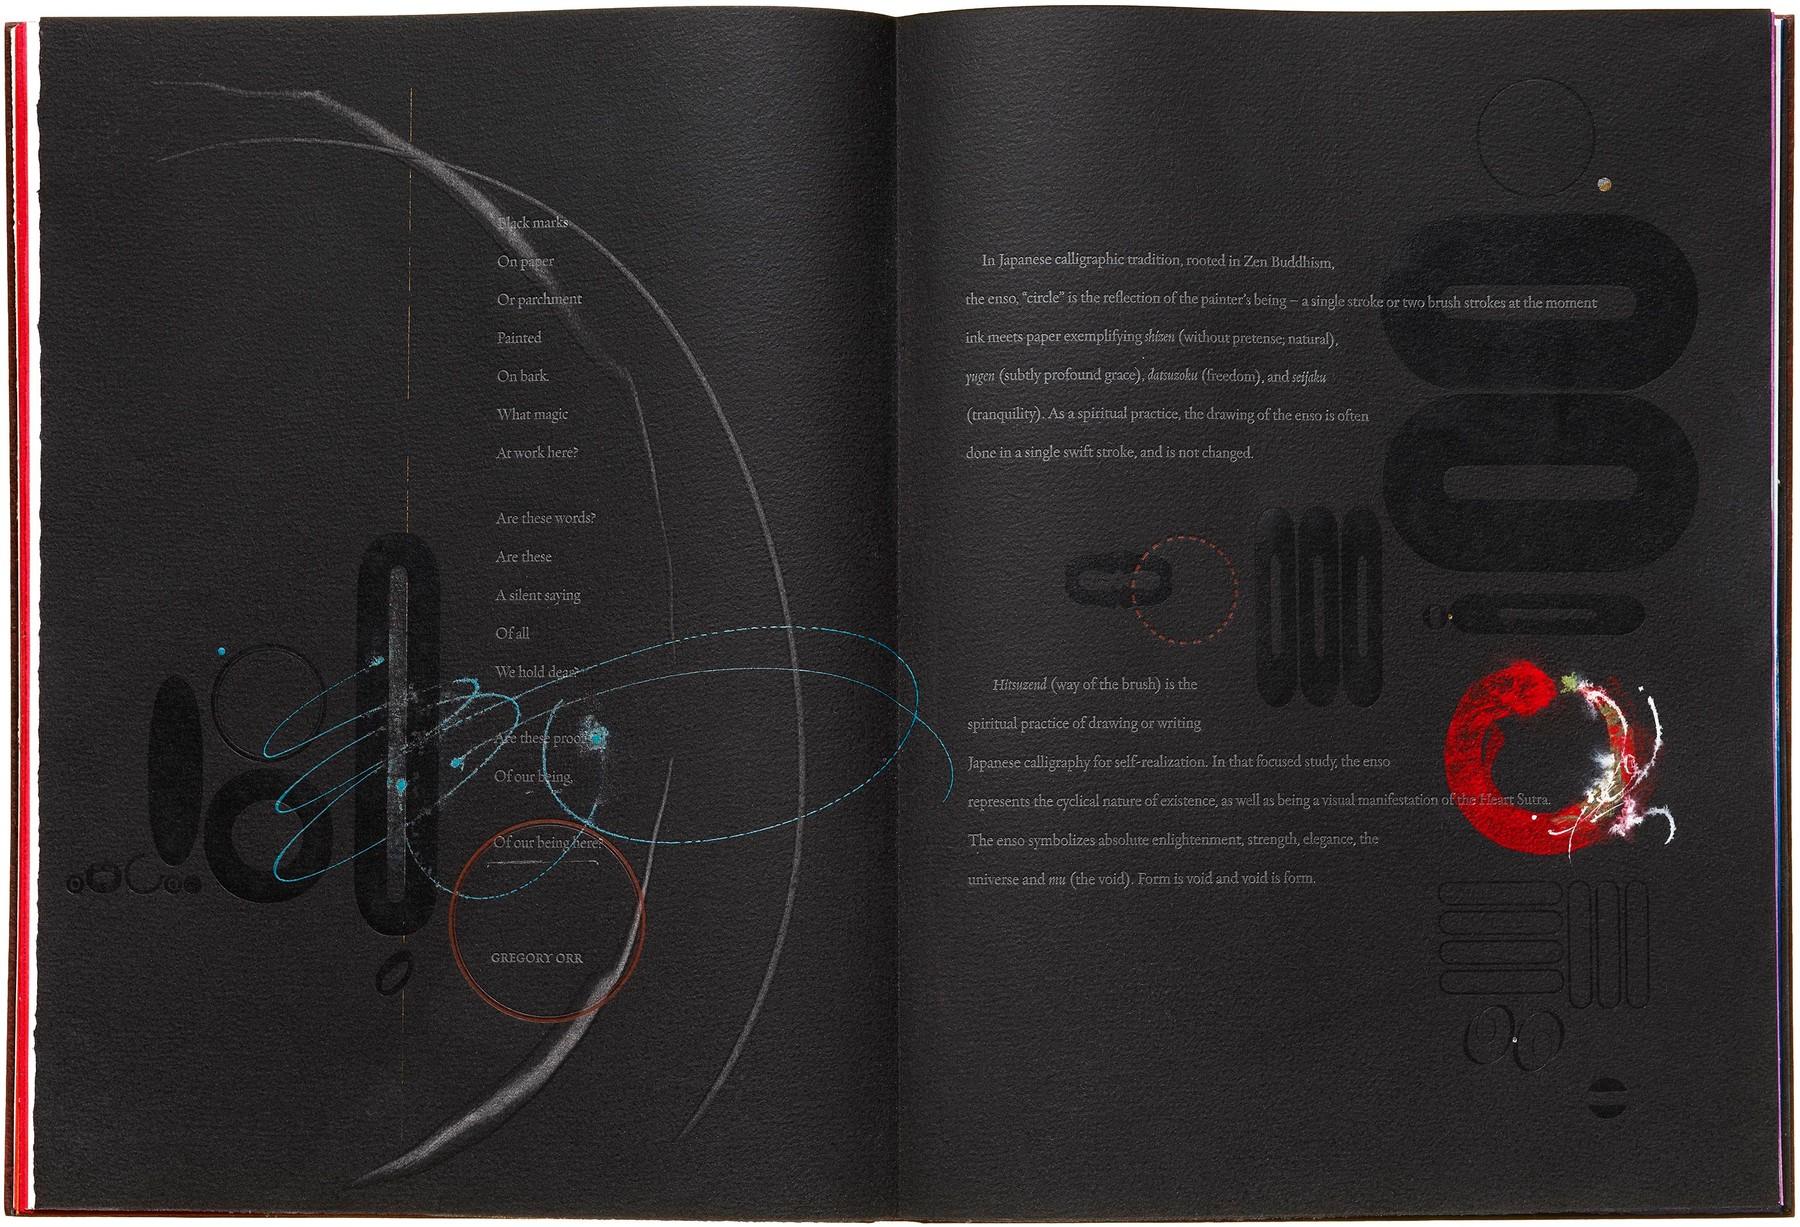 Zero: Cypher of Infinity — Suzanne Moore